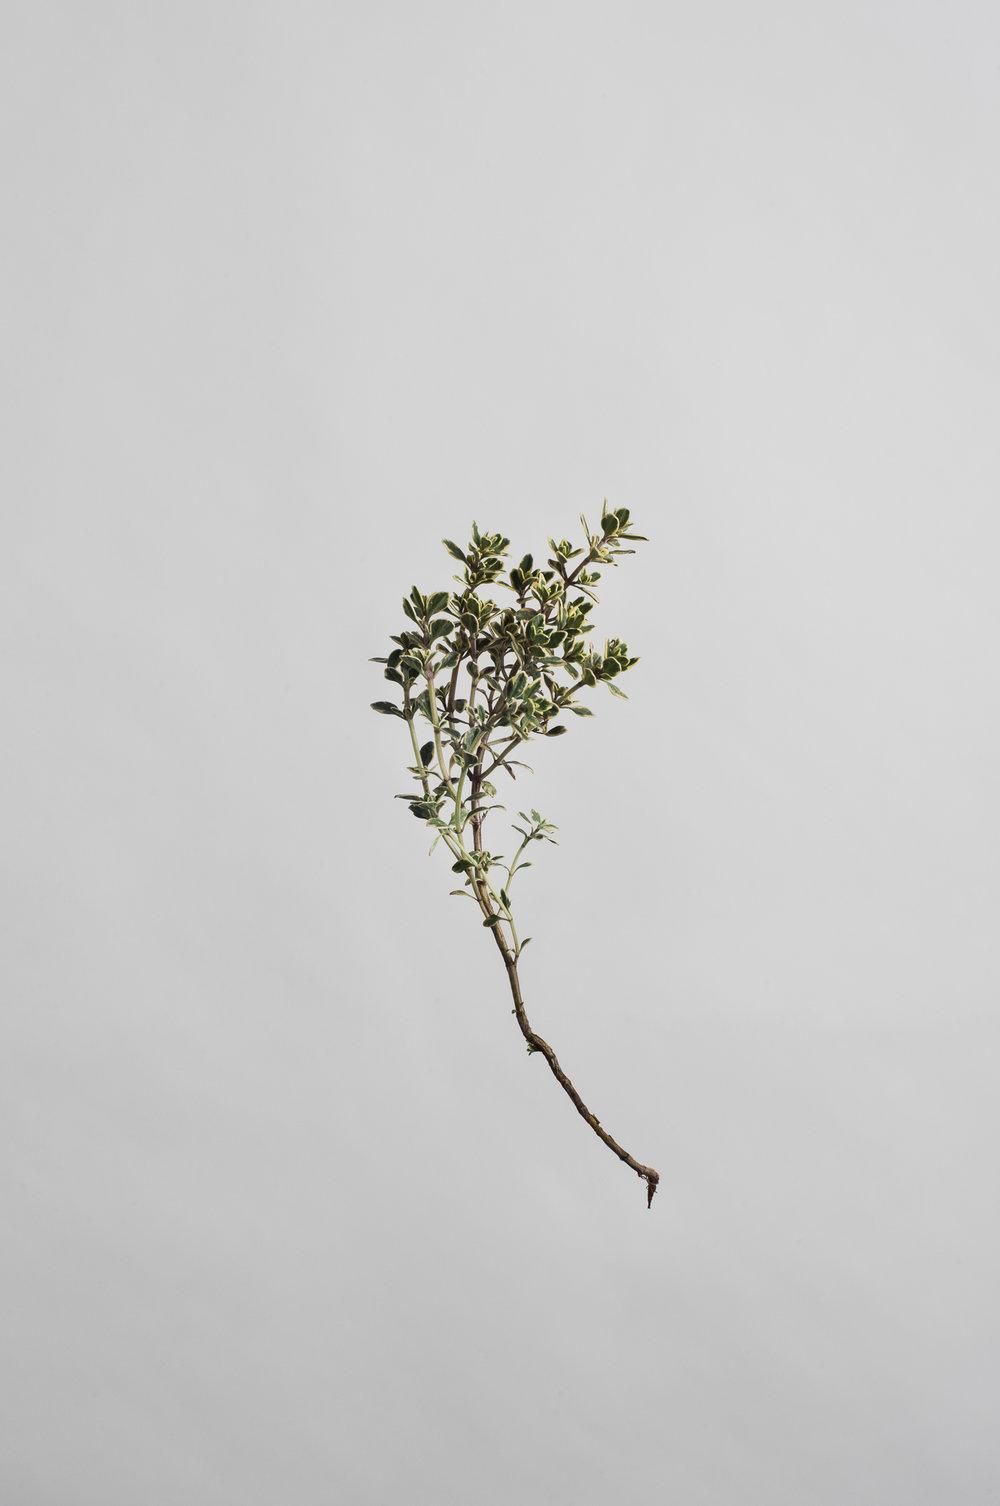 Thymus citriodorus - Lemon Thyme